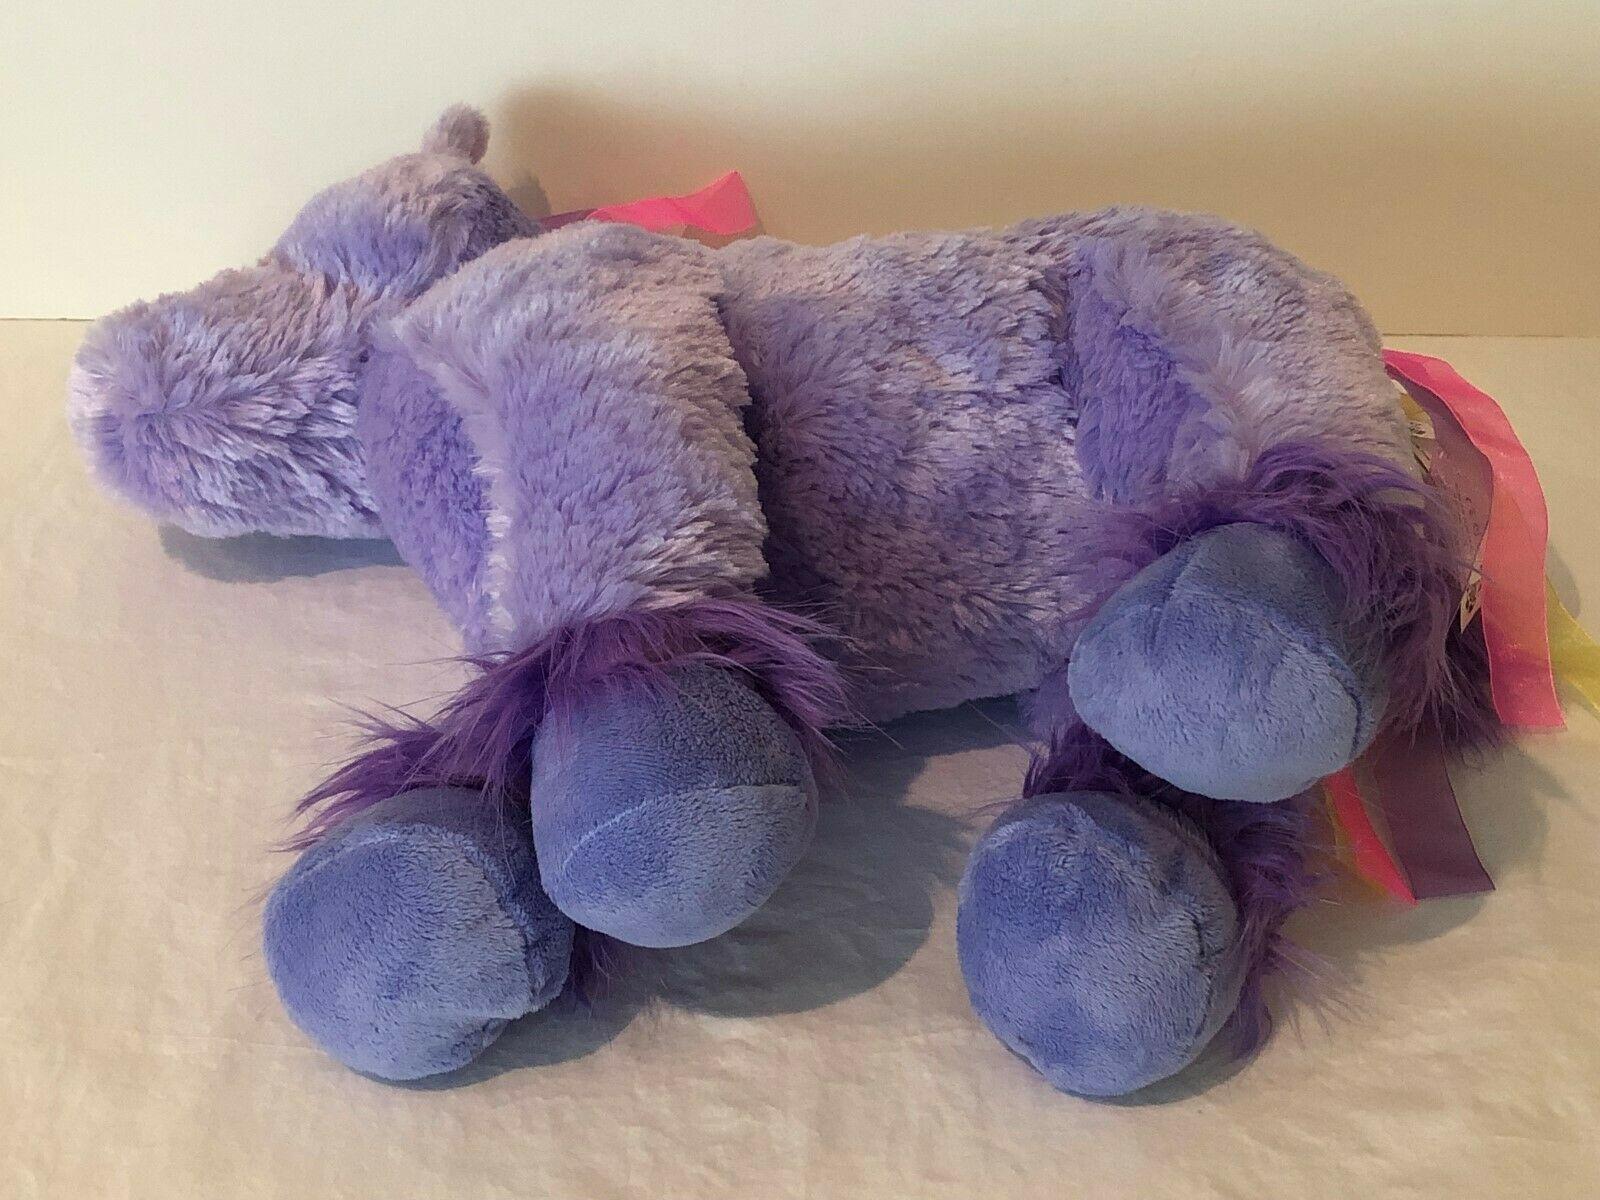 Unicorn Teddy Bear Toys R Us, Animal Alley Unicorn Purple Plush Toys R Us And 50 Similar Items